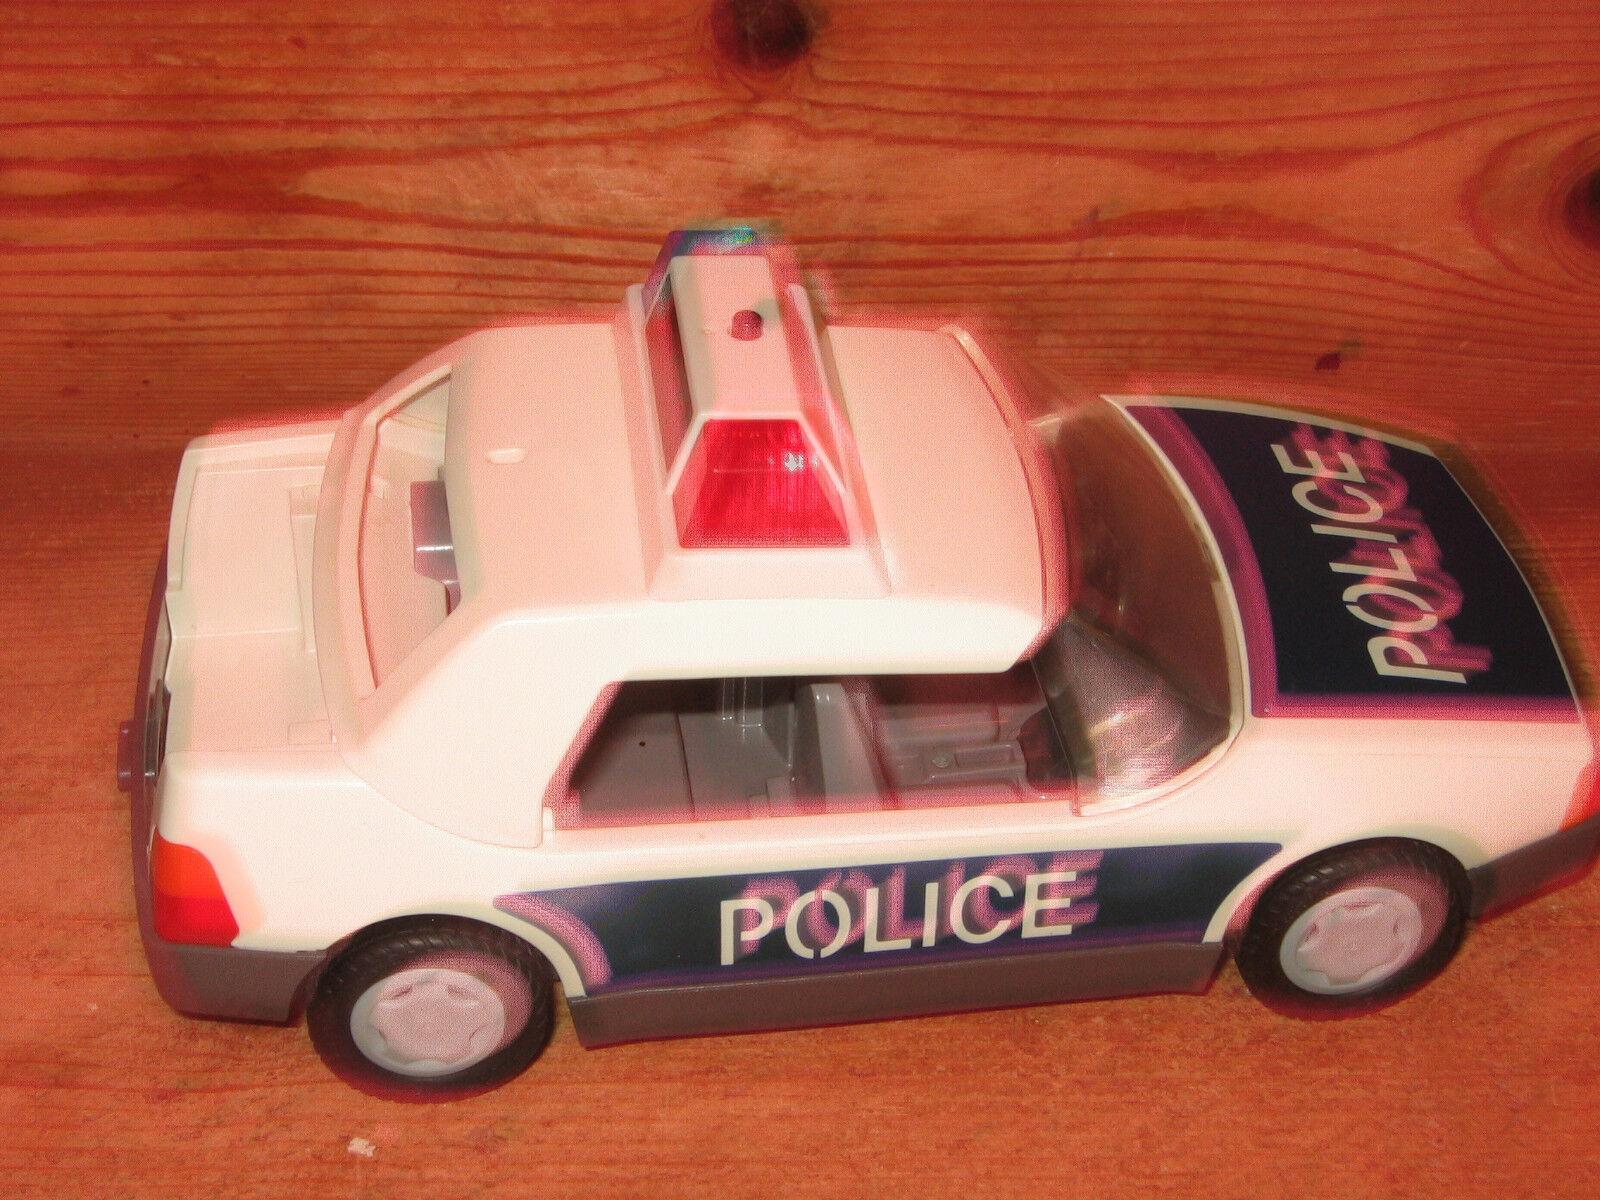 Playmobil 1997 coche de policía pushalong 8 INS INS INS Larga Luces Intermitentes Techo Desmontable aff330